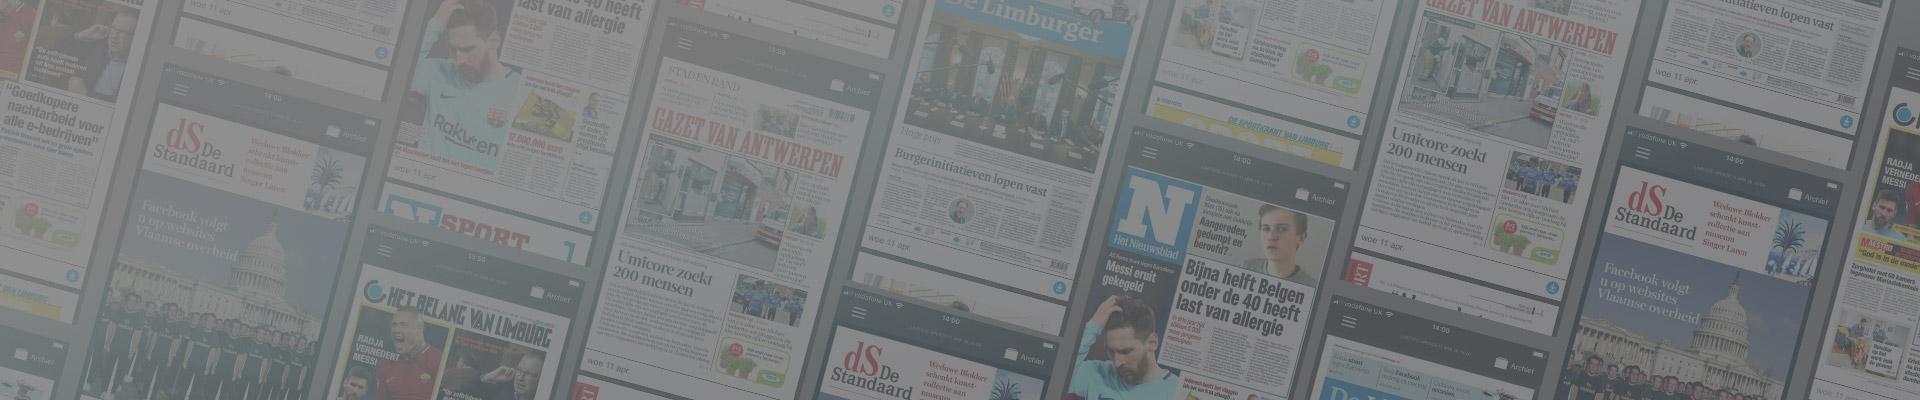 Header image of Mediahuis